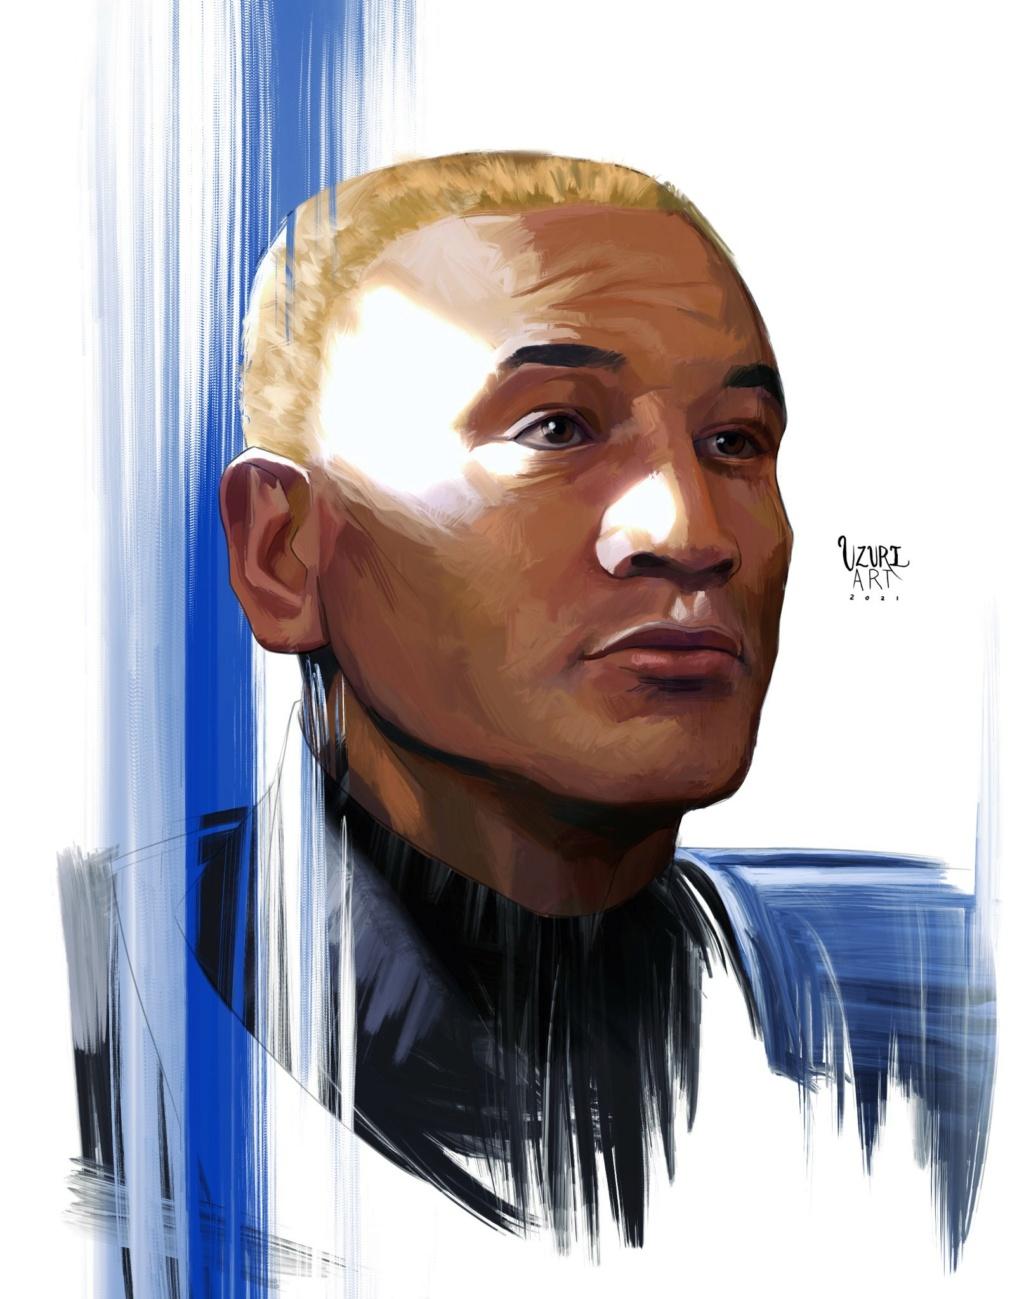 Digital Art par UZURI ART - Star Wars Uzuri_43